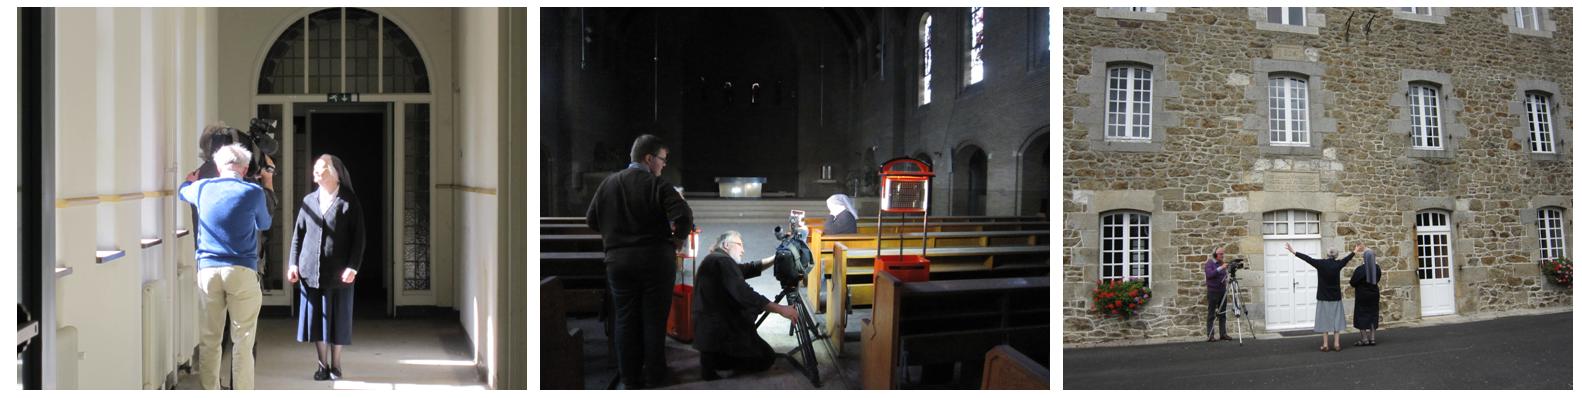 "Filmopnames voor de documentaire ""Adieu aux Sœurs"". (foto: Stichting Behoud Franse Klooster)"